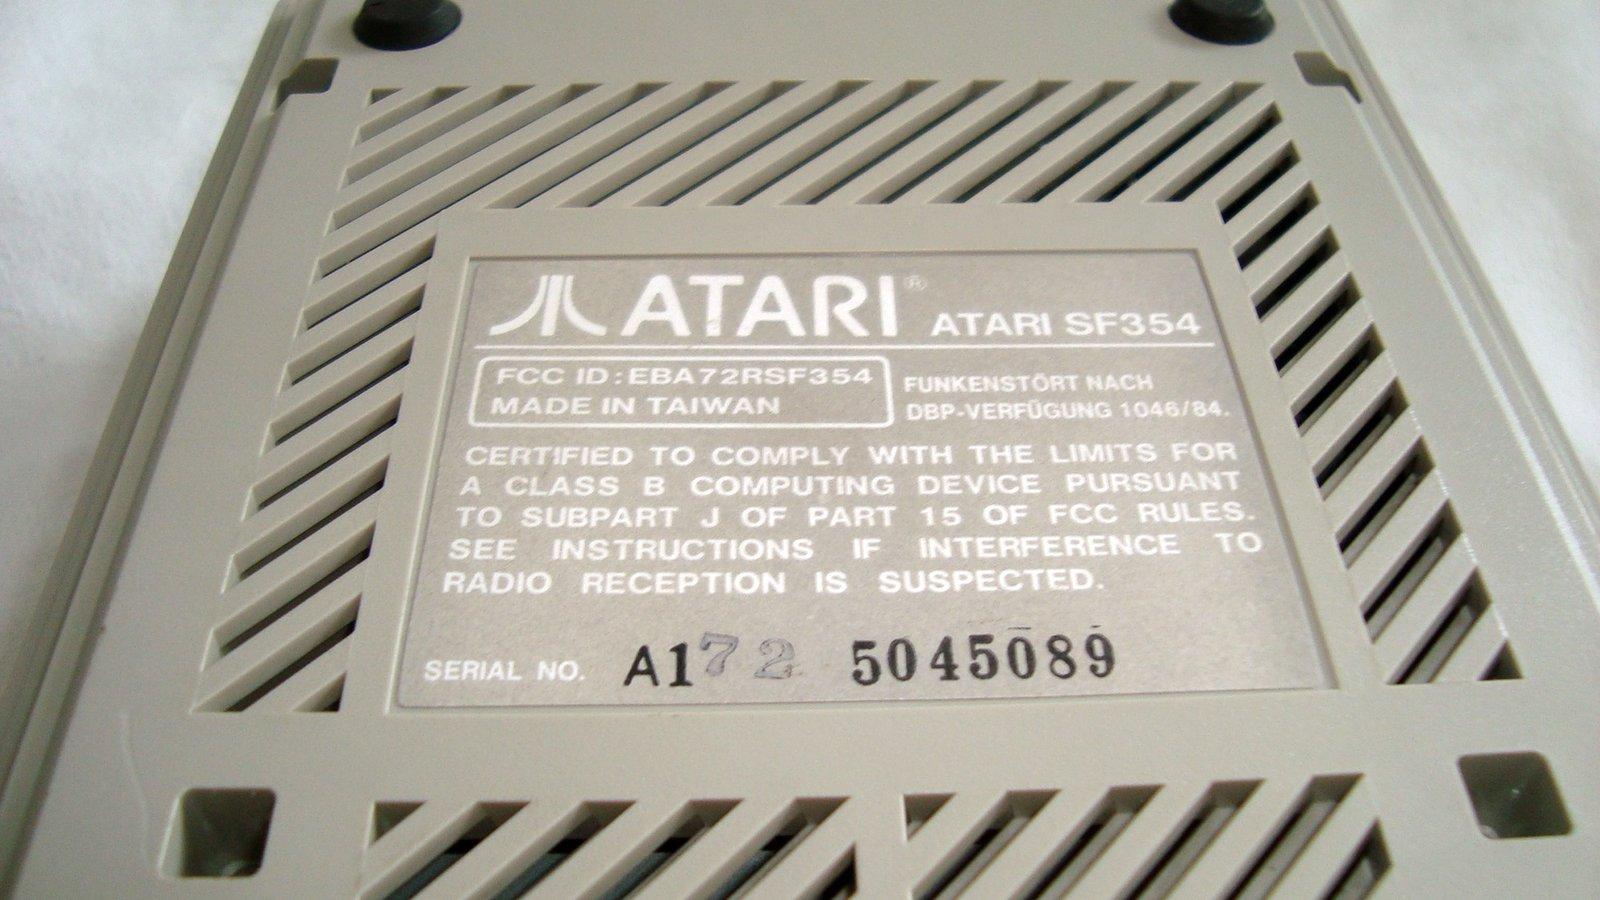 [TEST] Lecteurs disquettes externes SF354/SF314 - Atari ST 201007022338984832